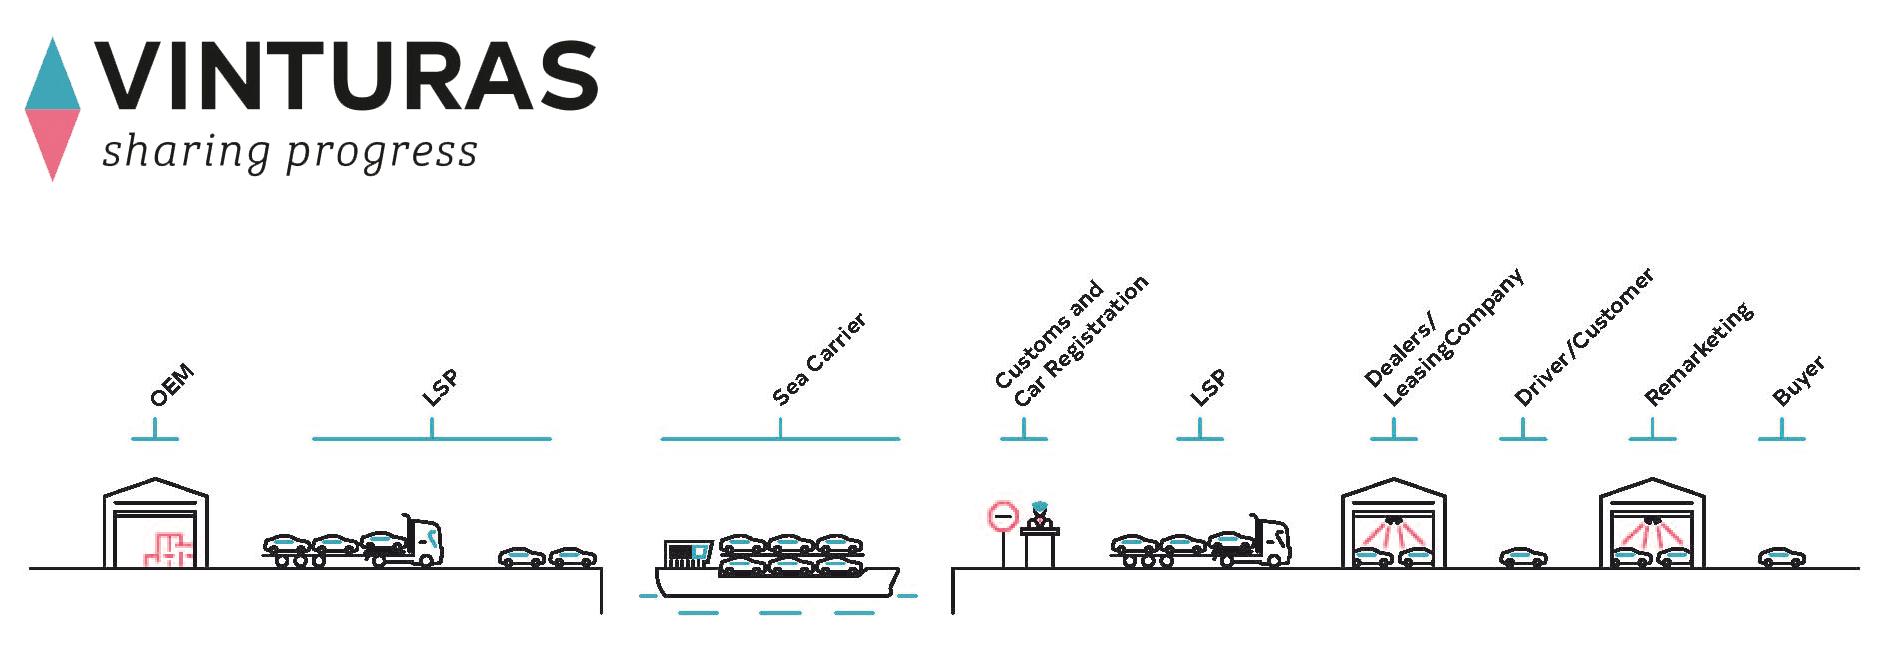 Vinturas la piattaforma blockchain per l'automotive